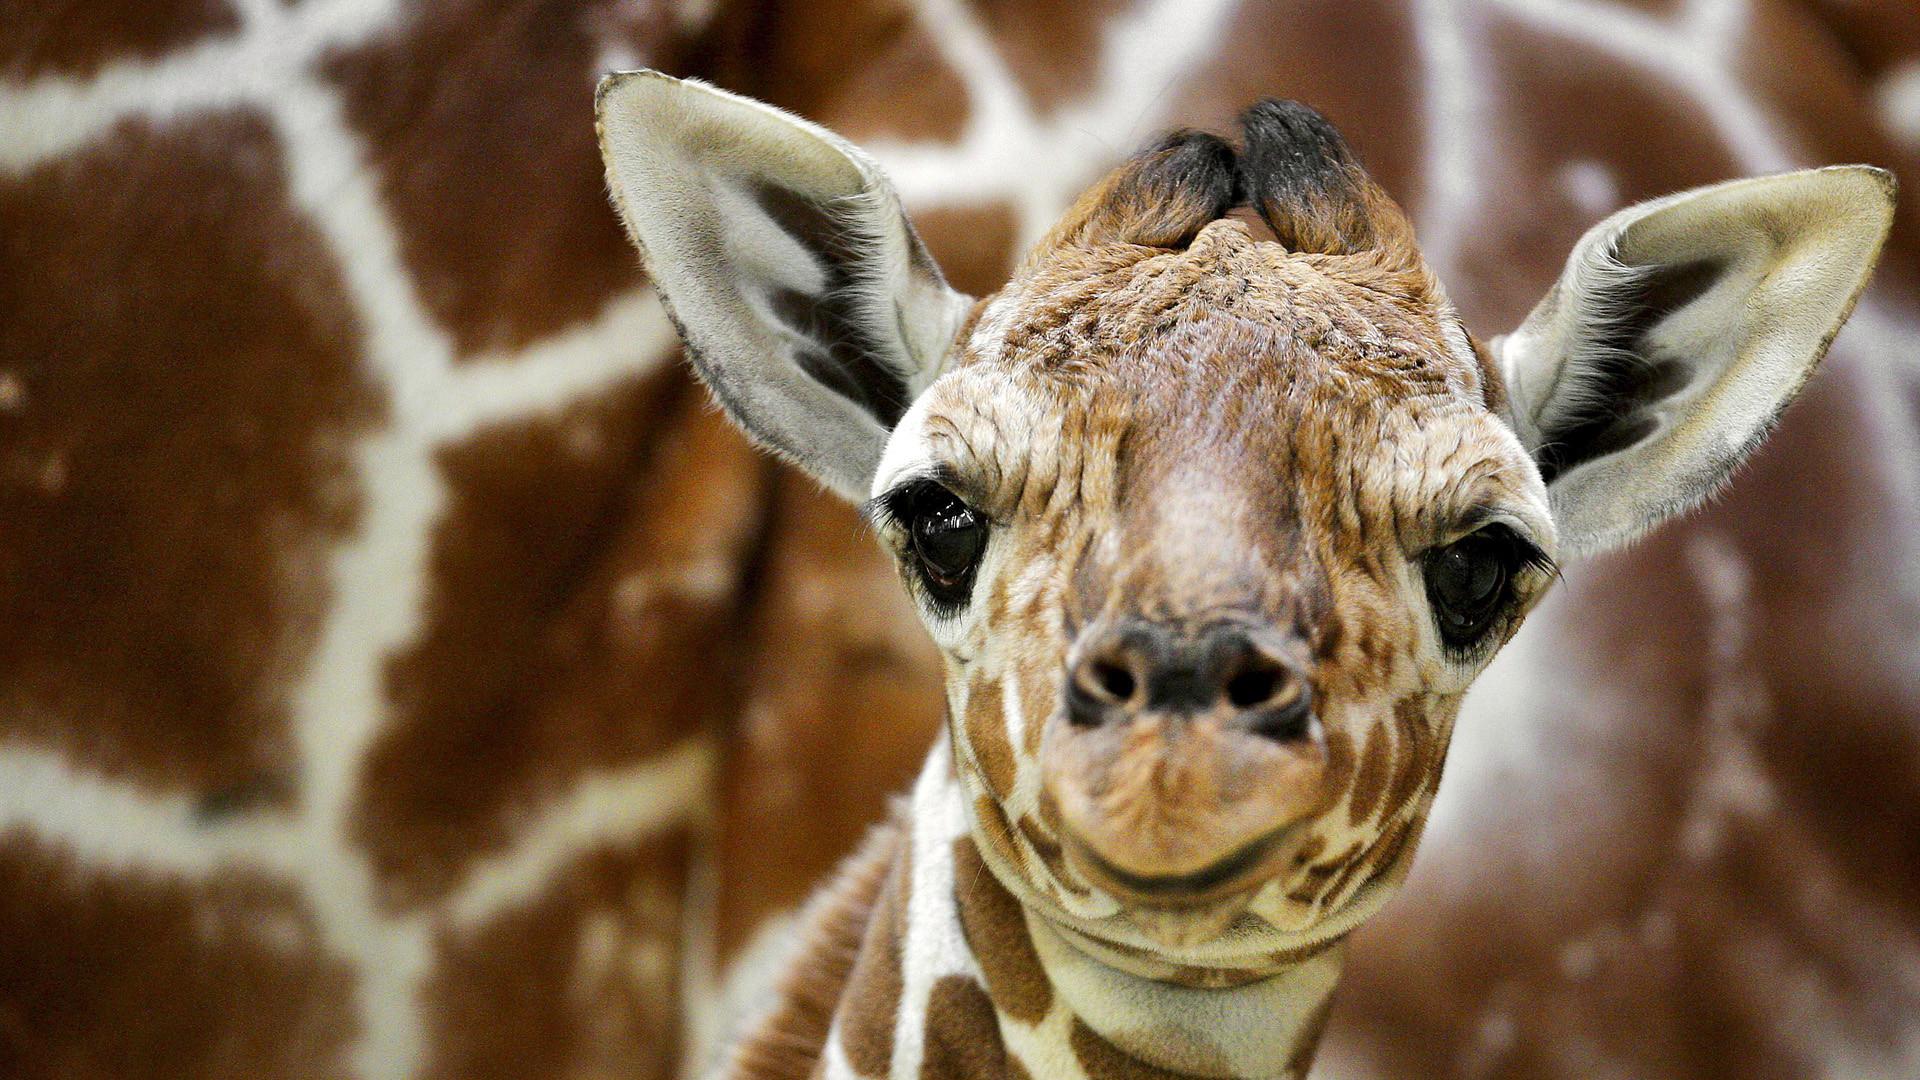 … Smartphone · Giraffe 1080p Wallpaper